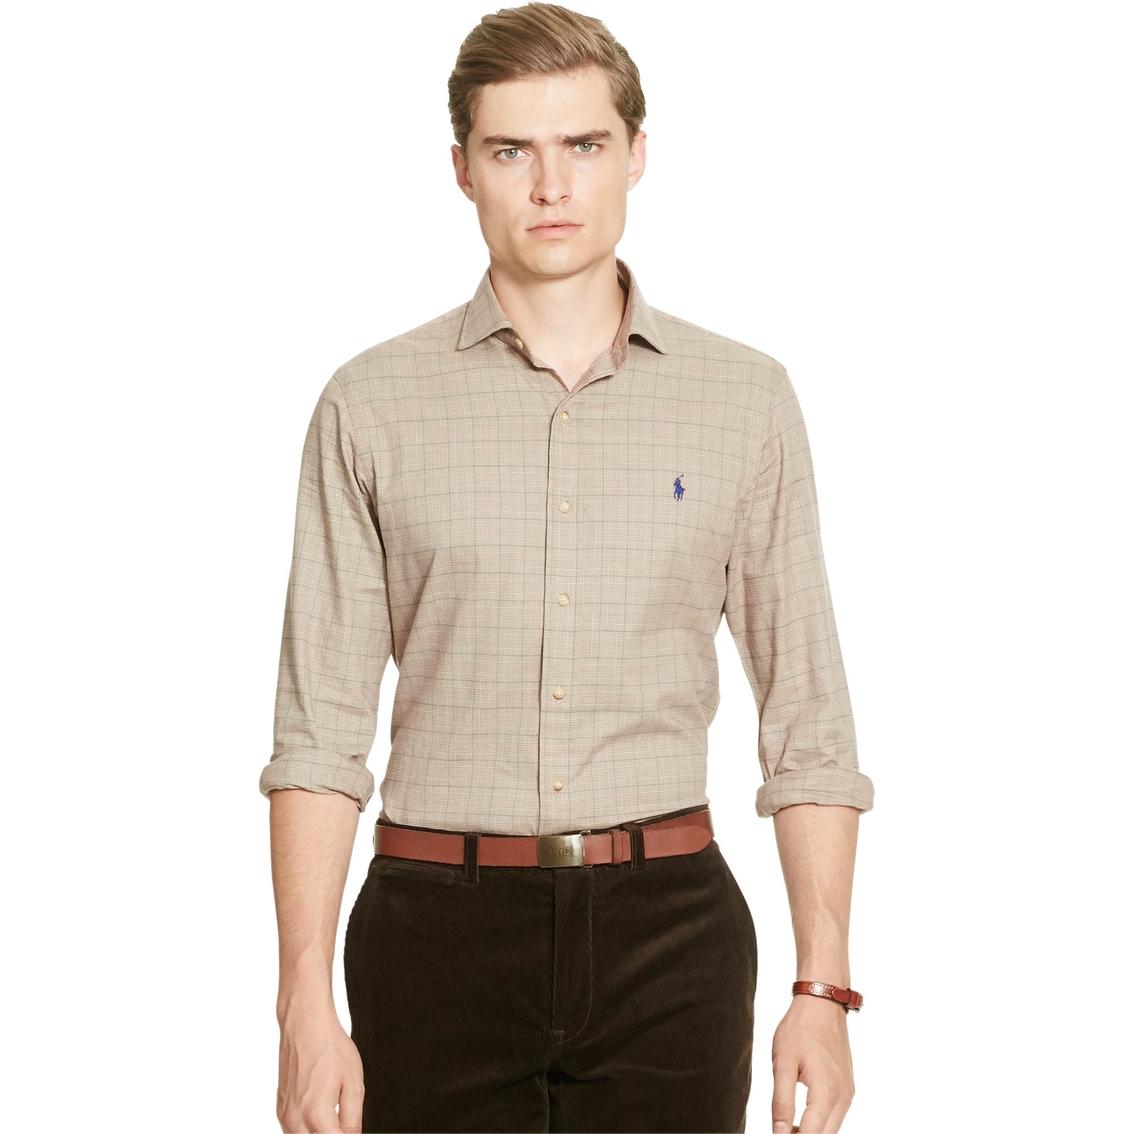 16113378f157 Polo Ralph Lauren Slim Fit Plaid Cotton Twill Shirt